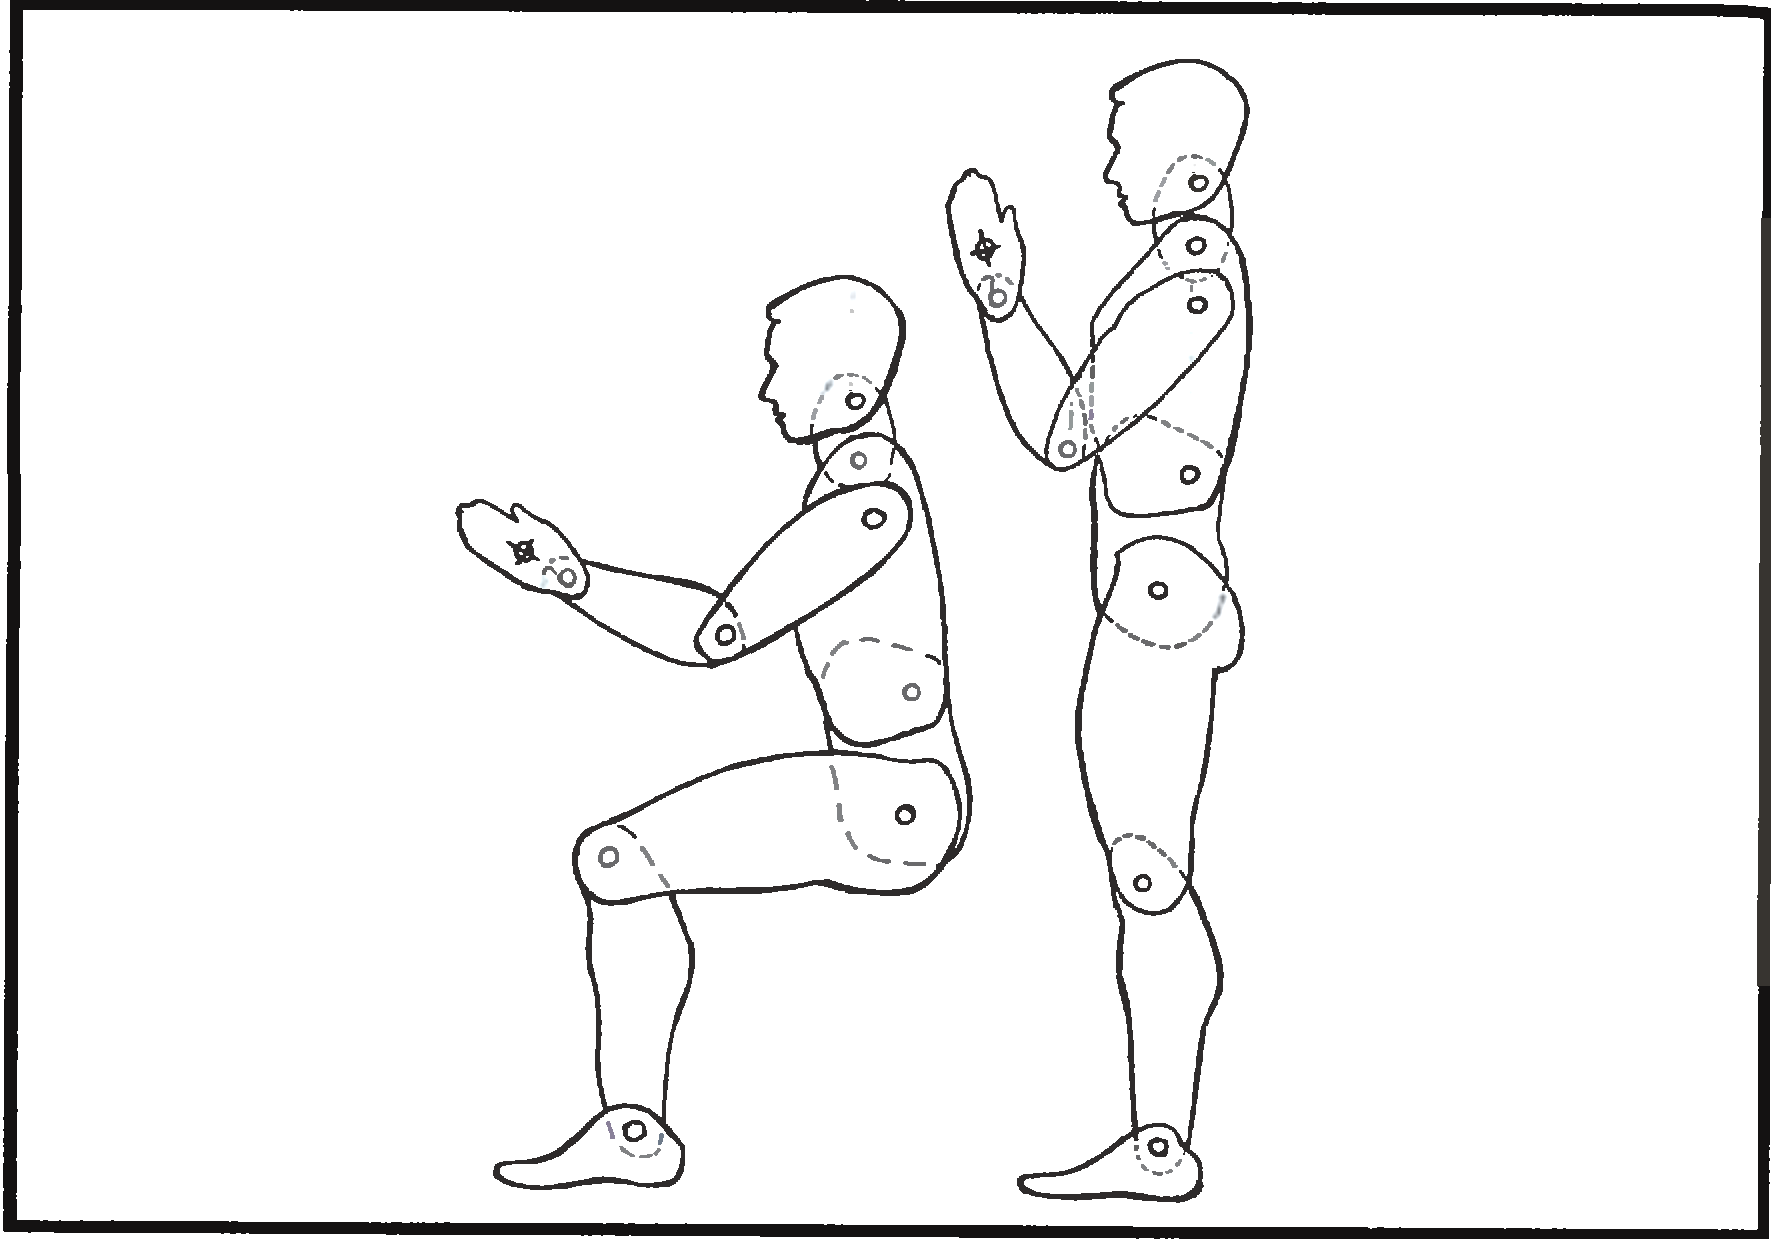 Схема модель человека